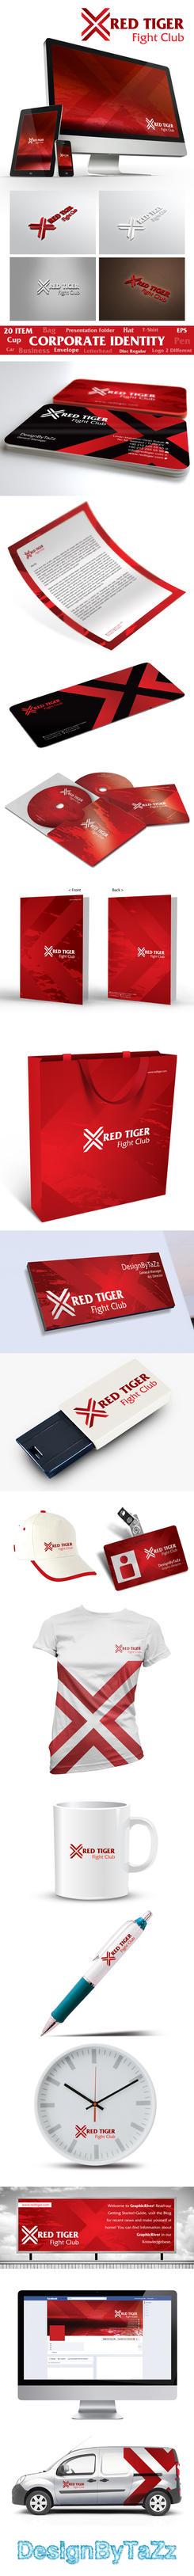 Red Tiger Corporate Identity by korkutaykut